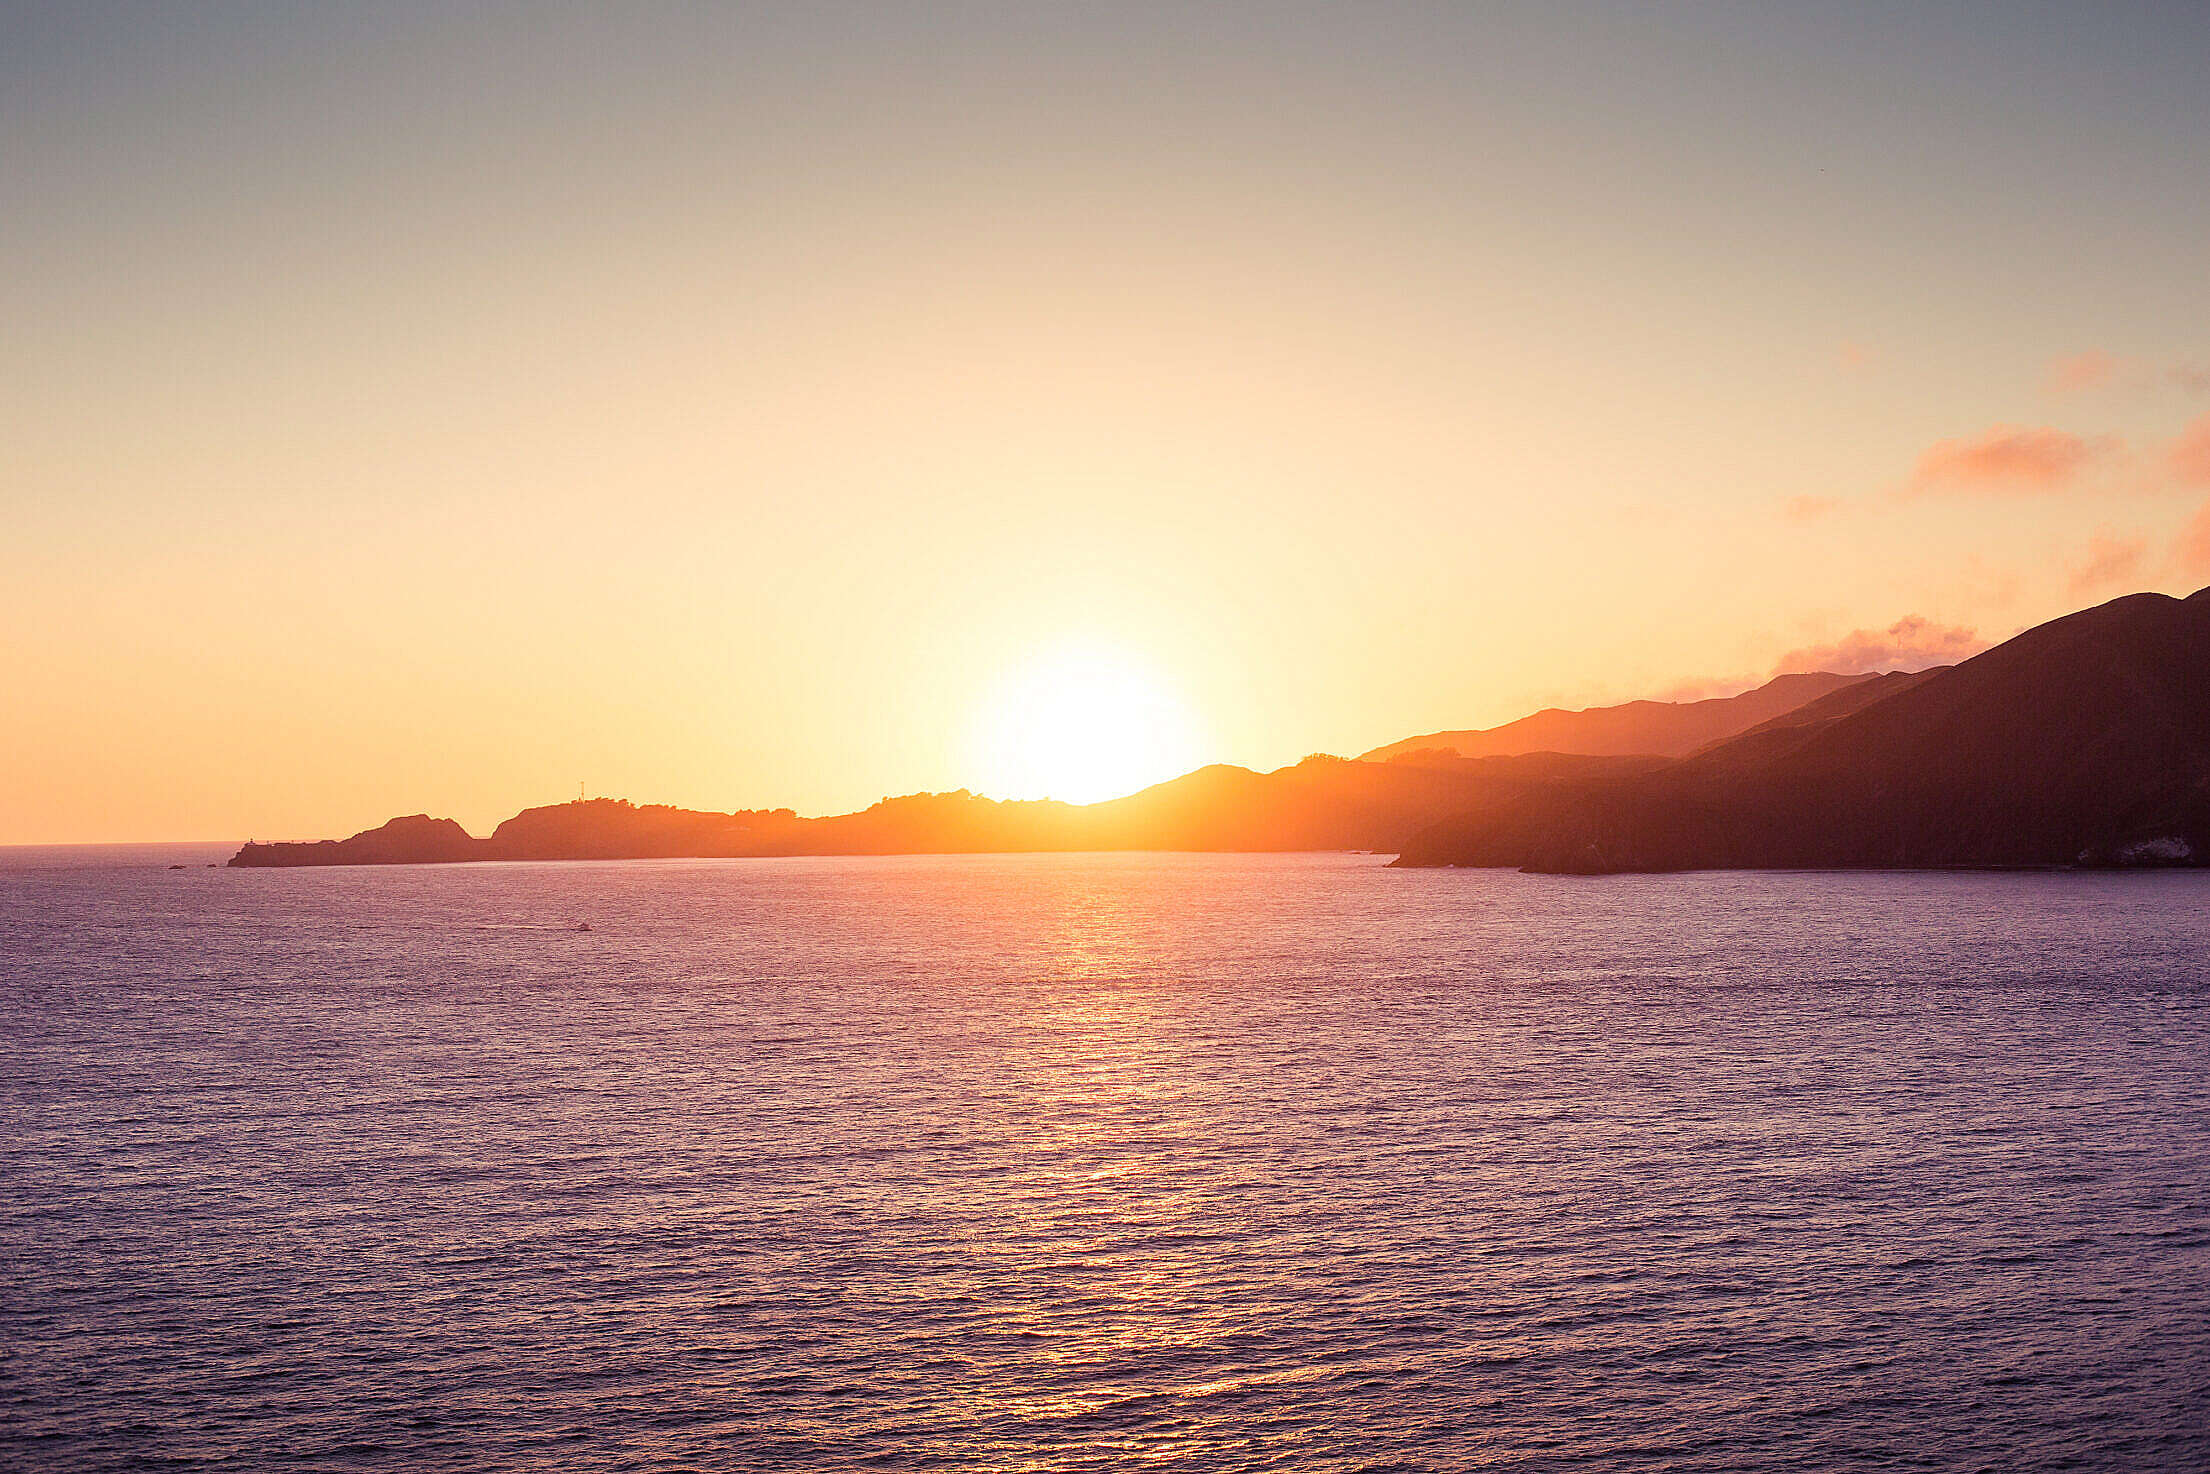 Ocean Panorama Sunset Free Stock Photo